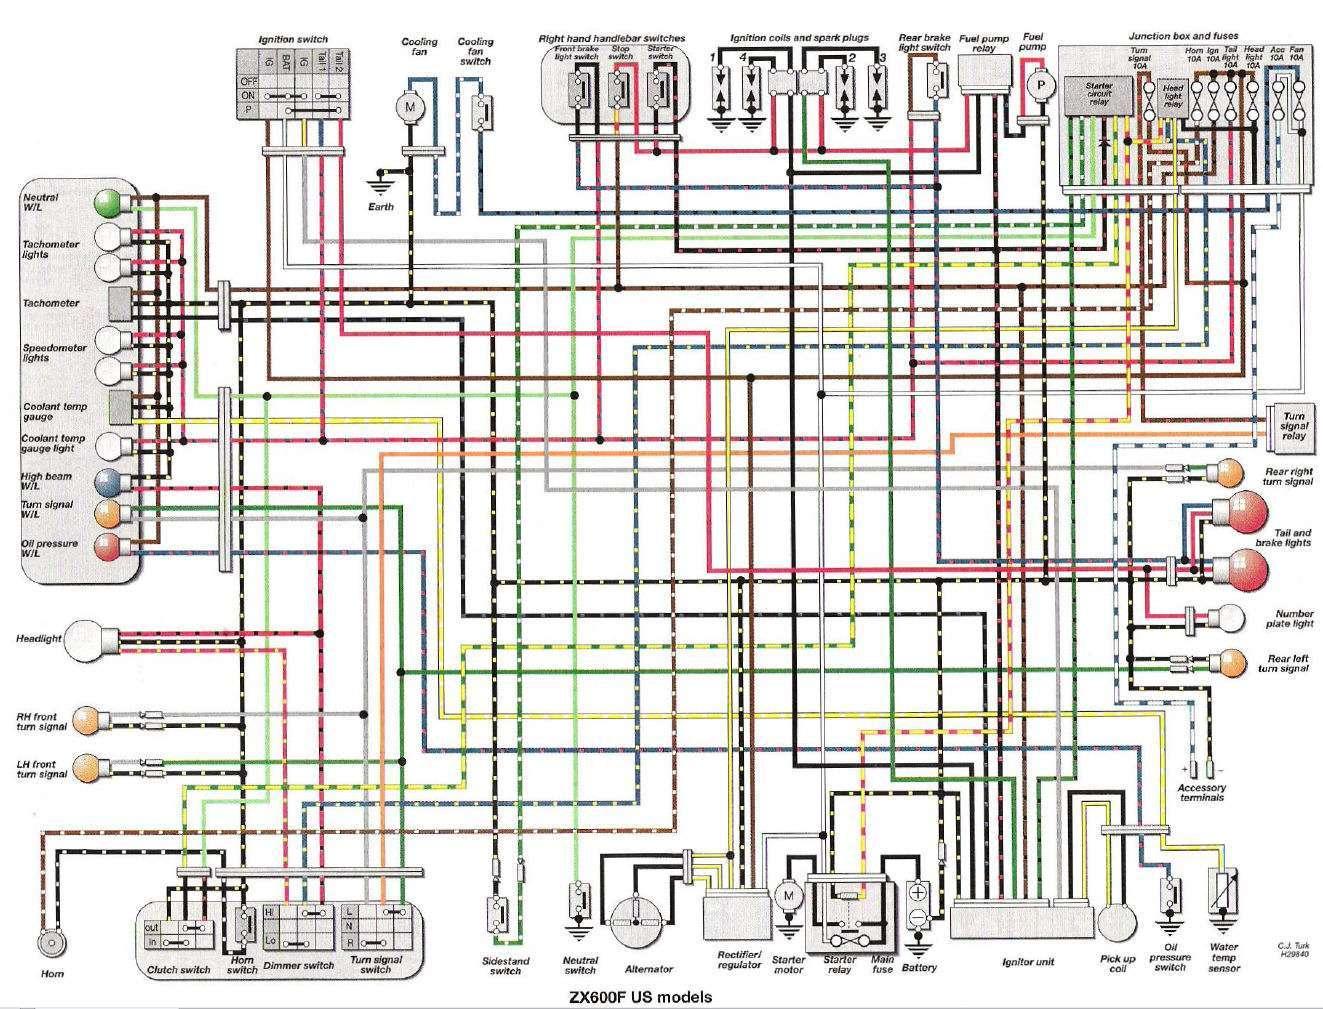 03 Yamaha R1 Wiring Harness Wiring Diagram Report1 Report1 Maceratadoc It